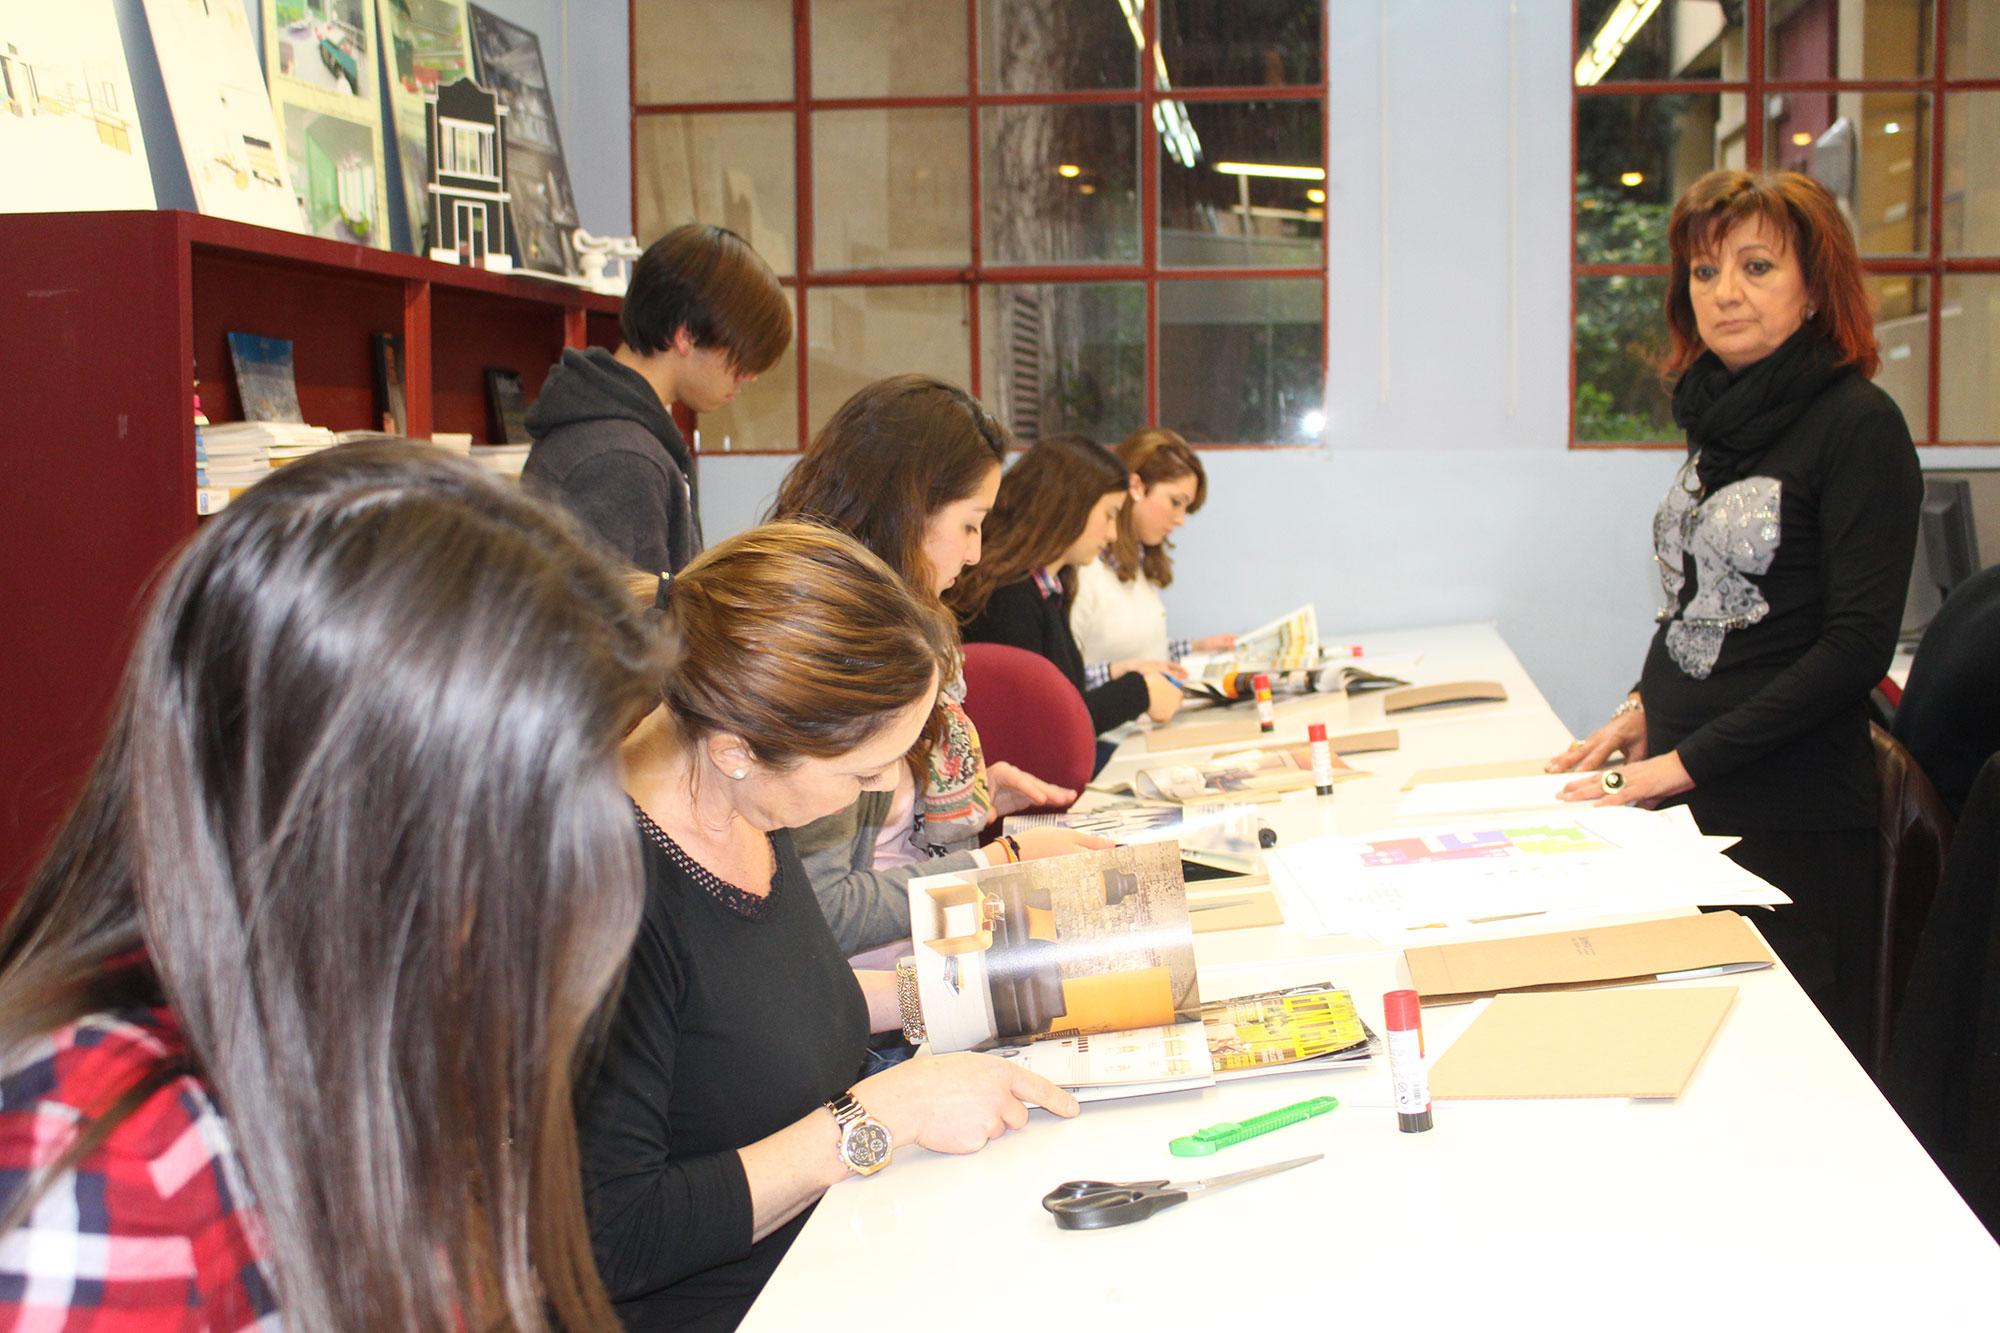 Estudiar decoracion de interiores - Donde estudiar interiorismo ...